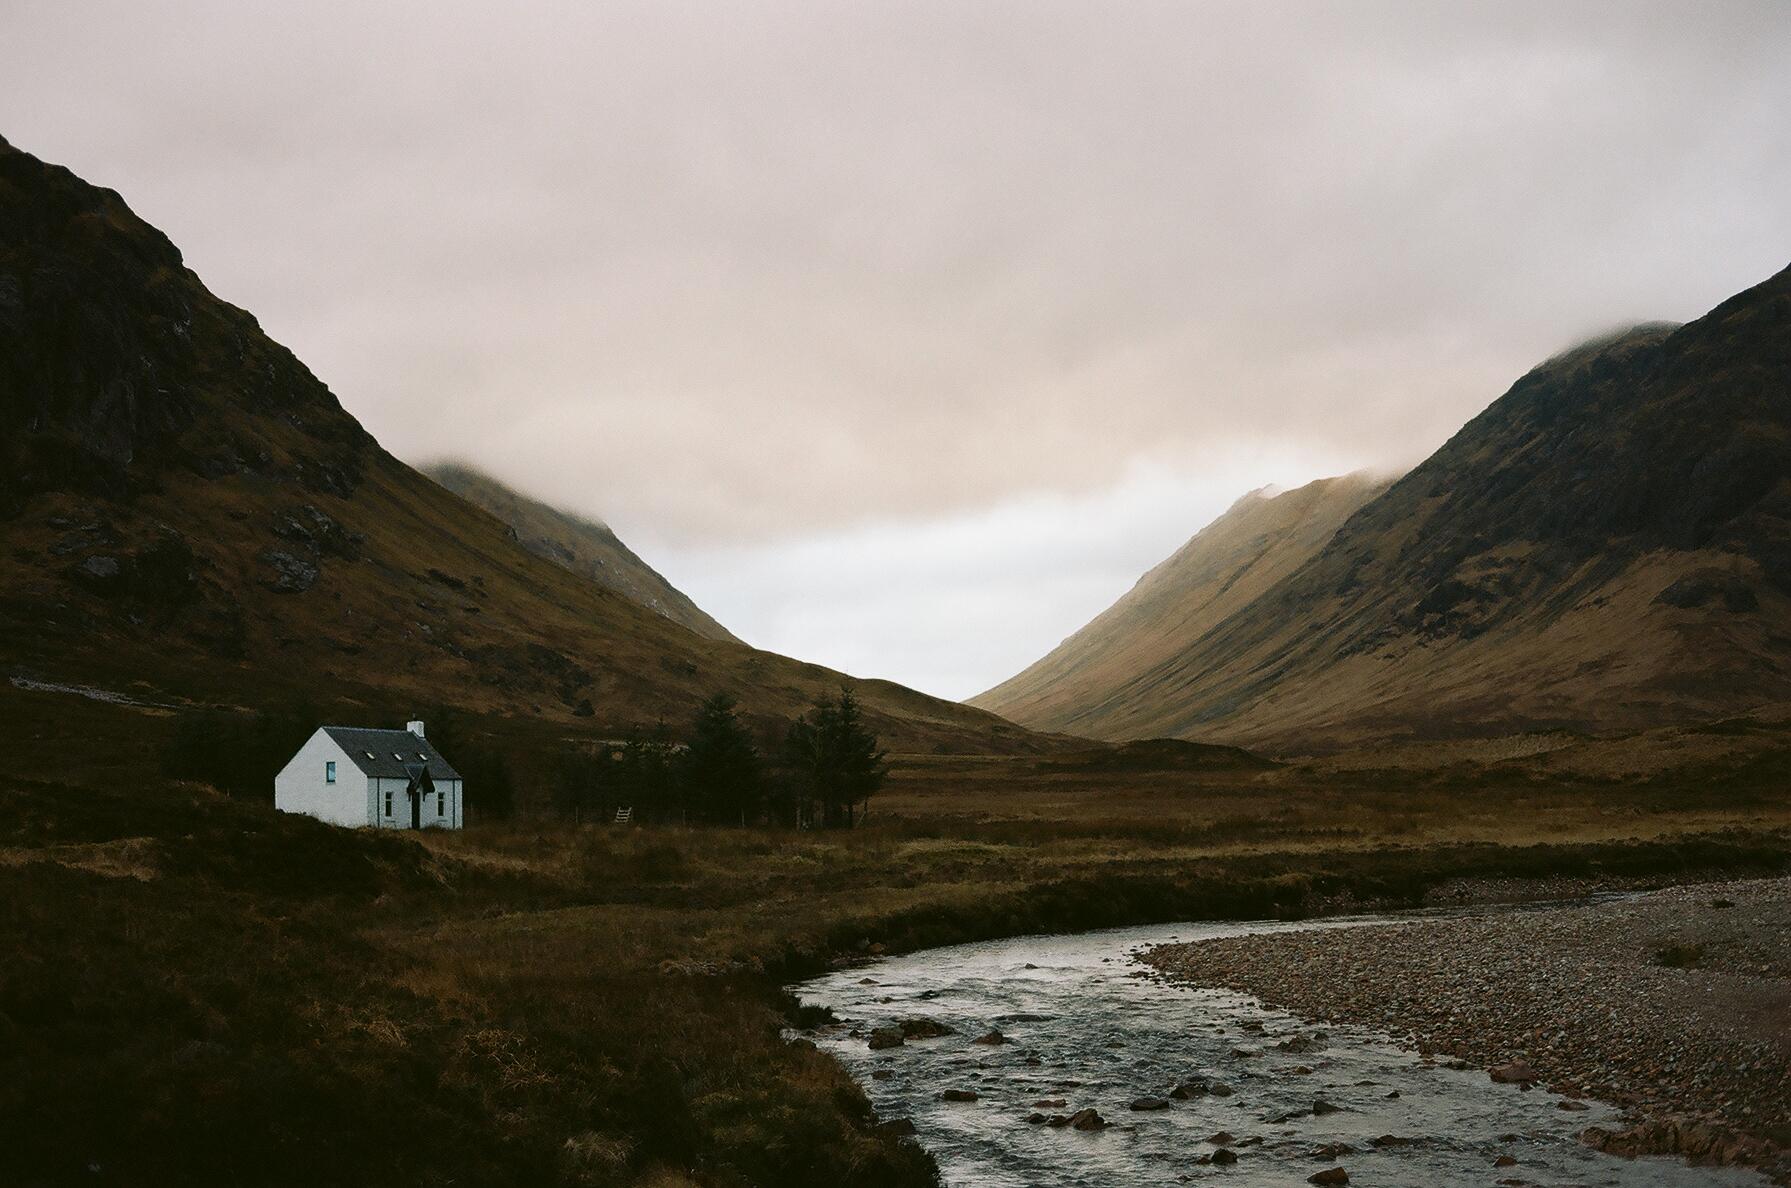 Buachaille Etive Mor, Scotland.